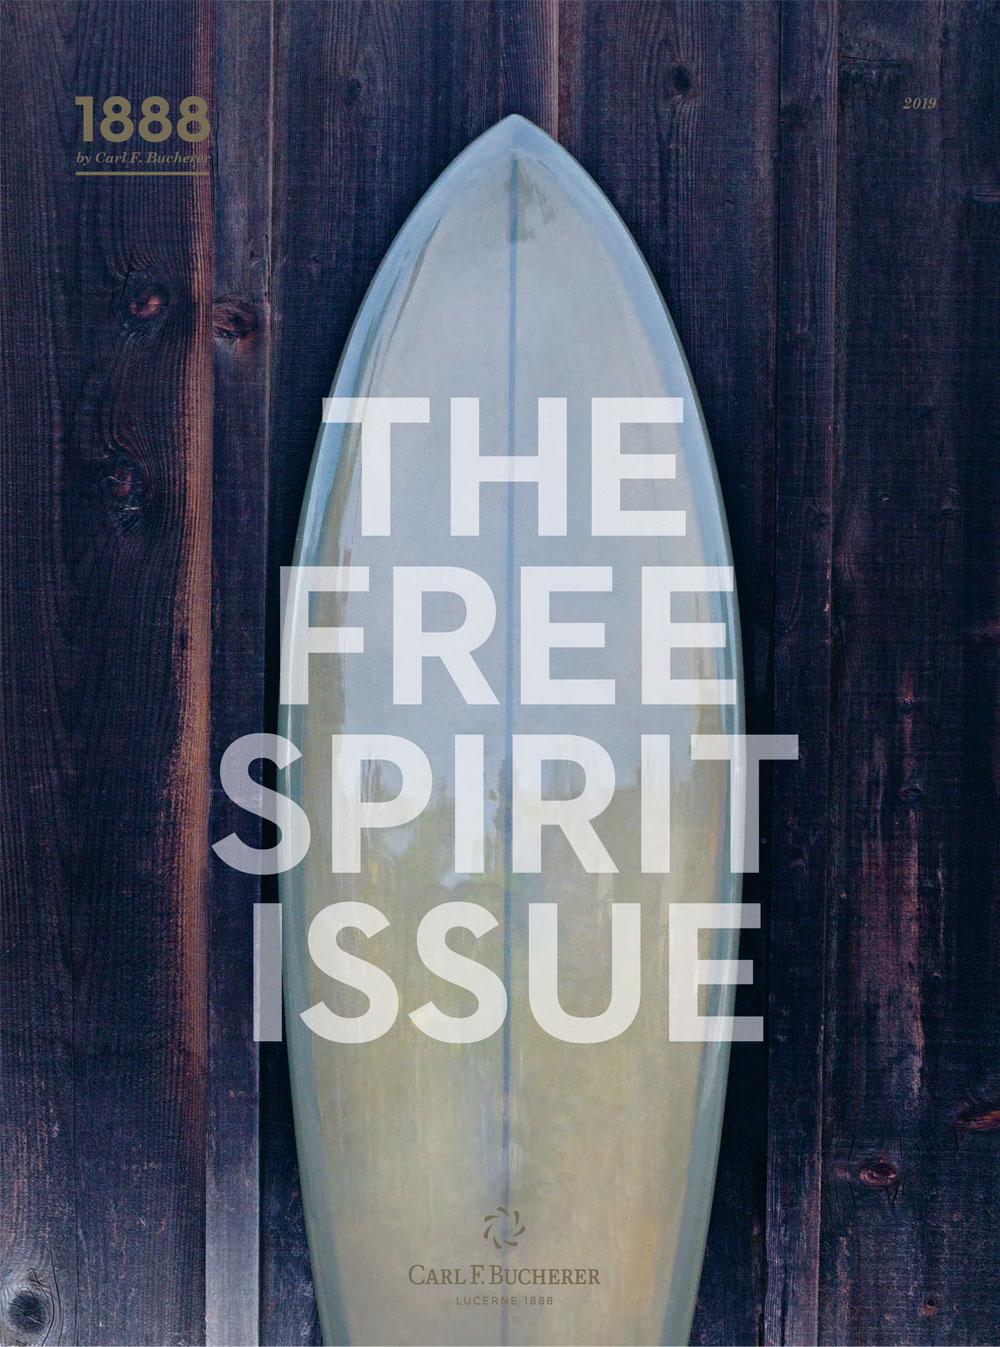 TheFreeSpiritIssue.jpg